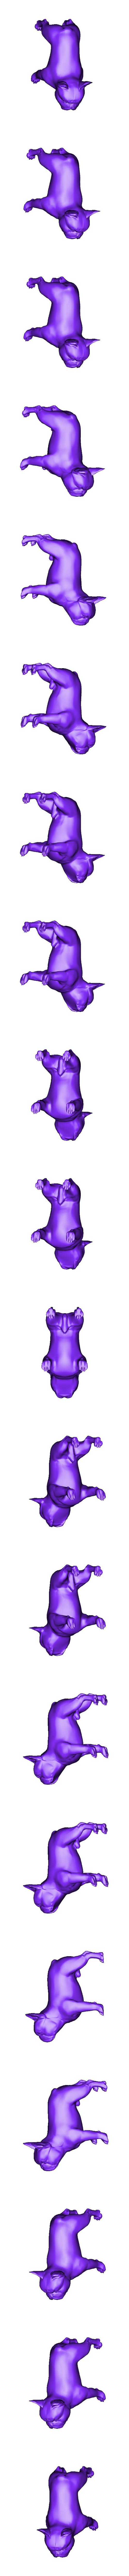 frb2.stl Download free STL file Perro Bull Dog FRENCH BULLDOG DOG • 3D printable object, PRODUSTL56